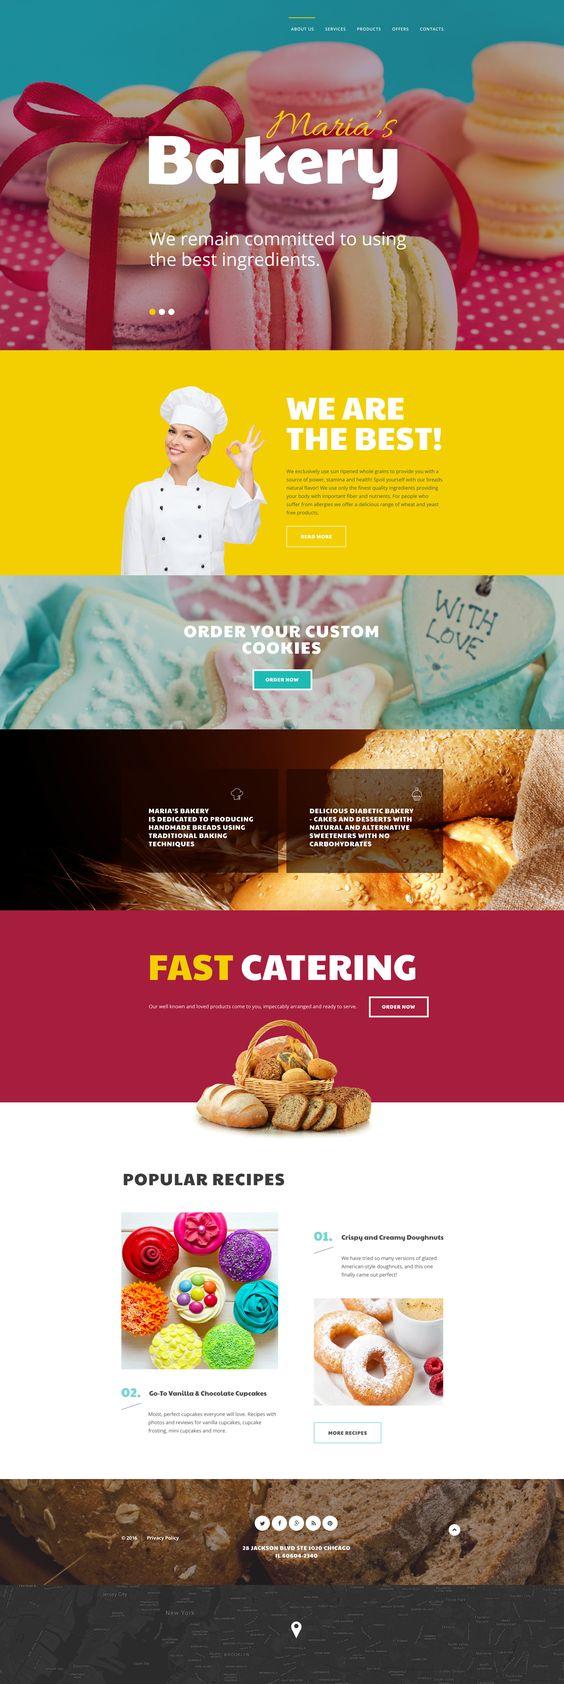 Bakery WebSite Template http://www.templatemonster.com/website-templates/maria-s-bakery-website-template-58701.html